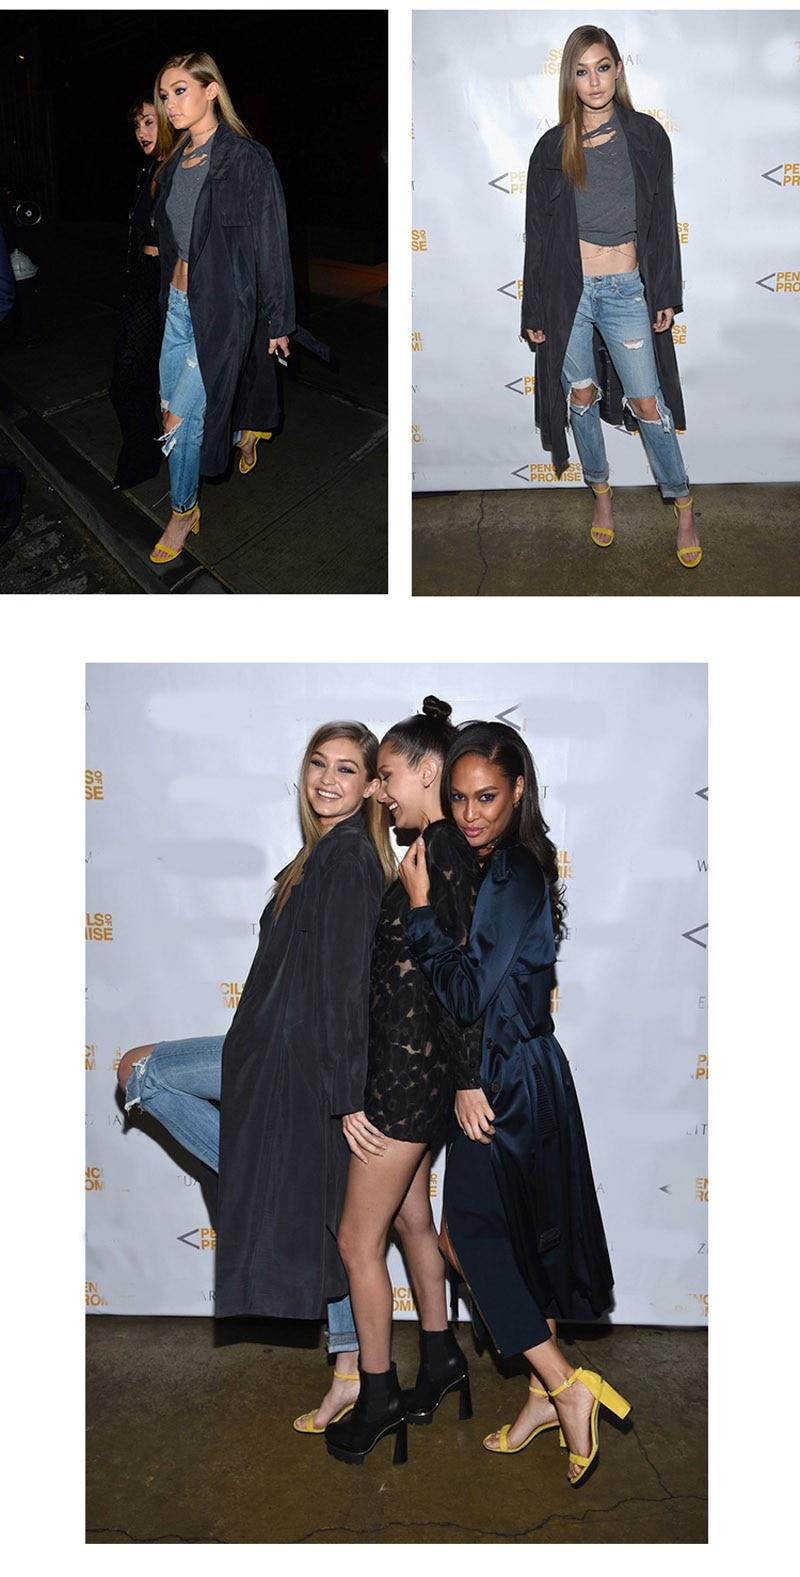 GENSHUO 2019 Ankle Strap Heels Women Sandals Summer Shoes Women Open Toe Chunky High Heels Party Dress Sandals Big Size 42